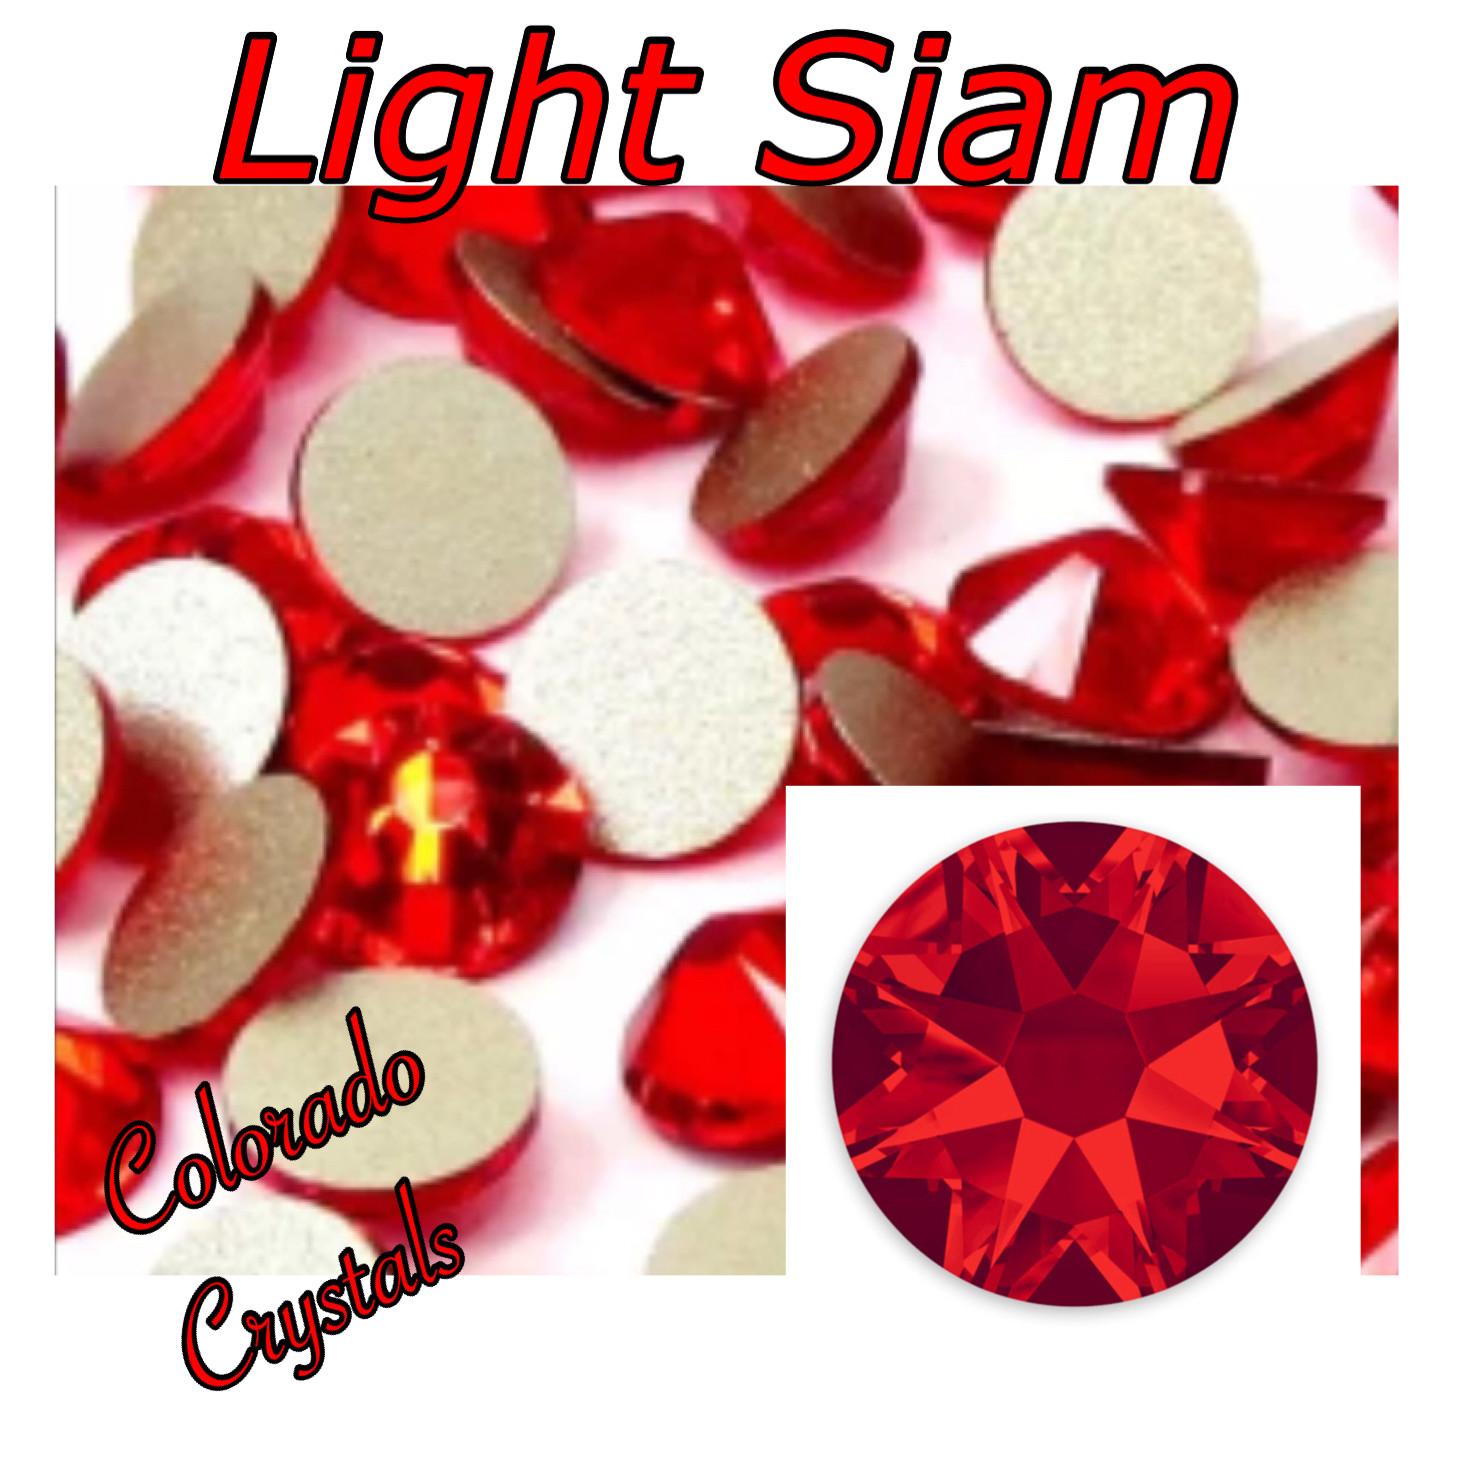 Light Siam 16ss 2088 Limited Swarovski Red Crystals